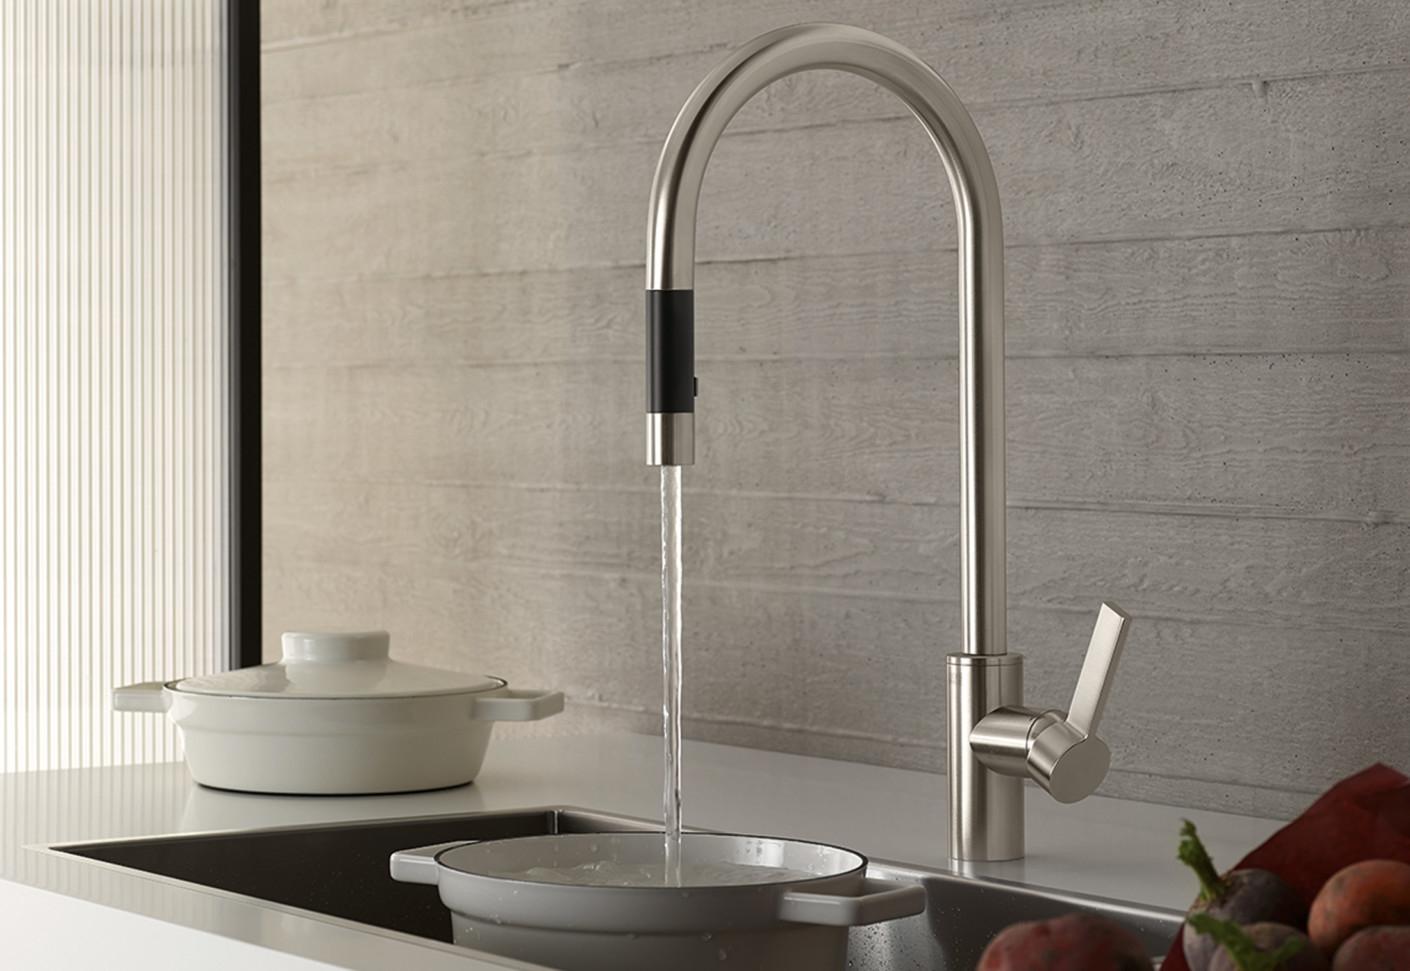 Ideas, kitchen dornbracht shower dornbracht kitchen faucet regarding measurements 1410 x 971  .